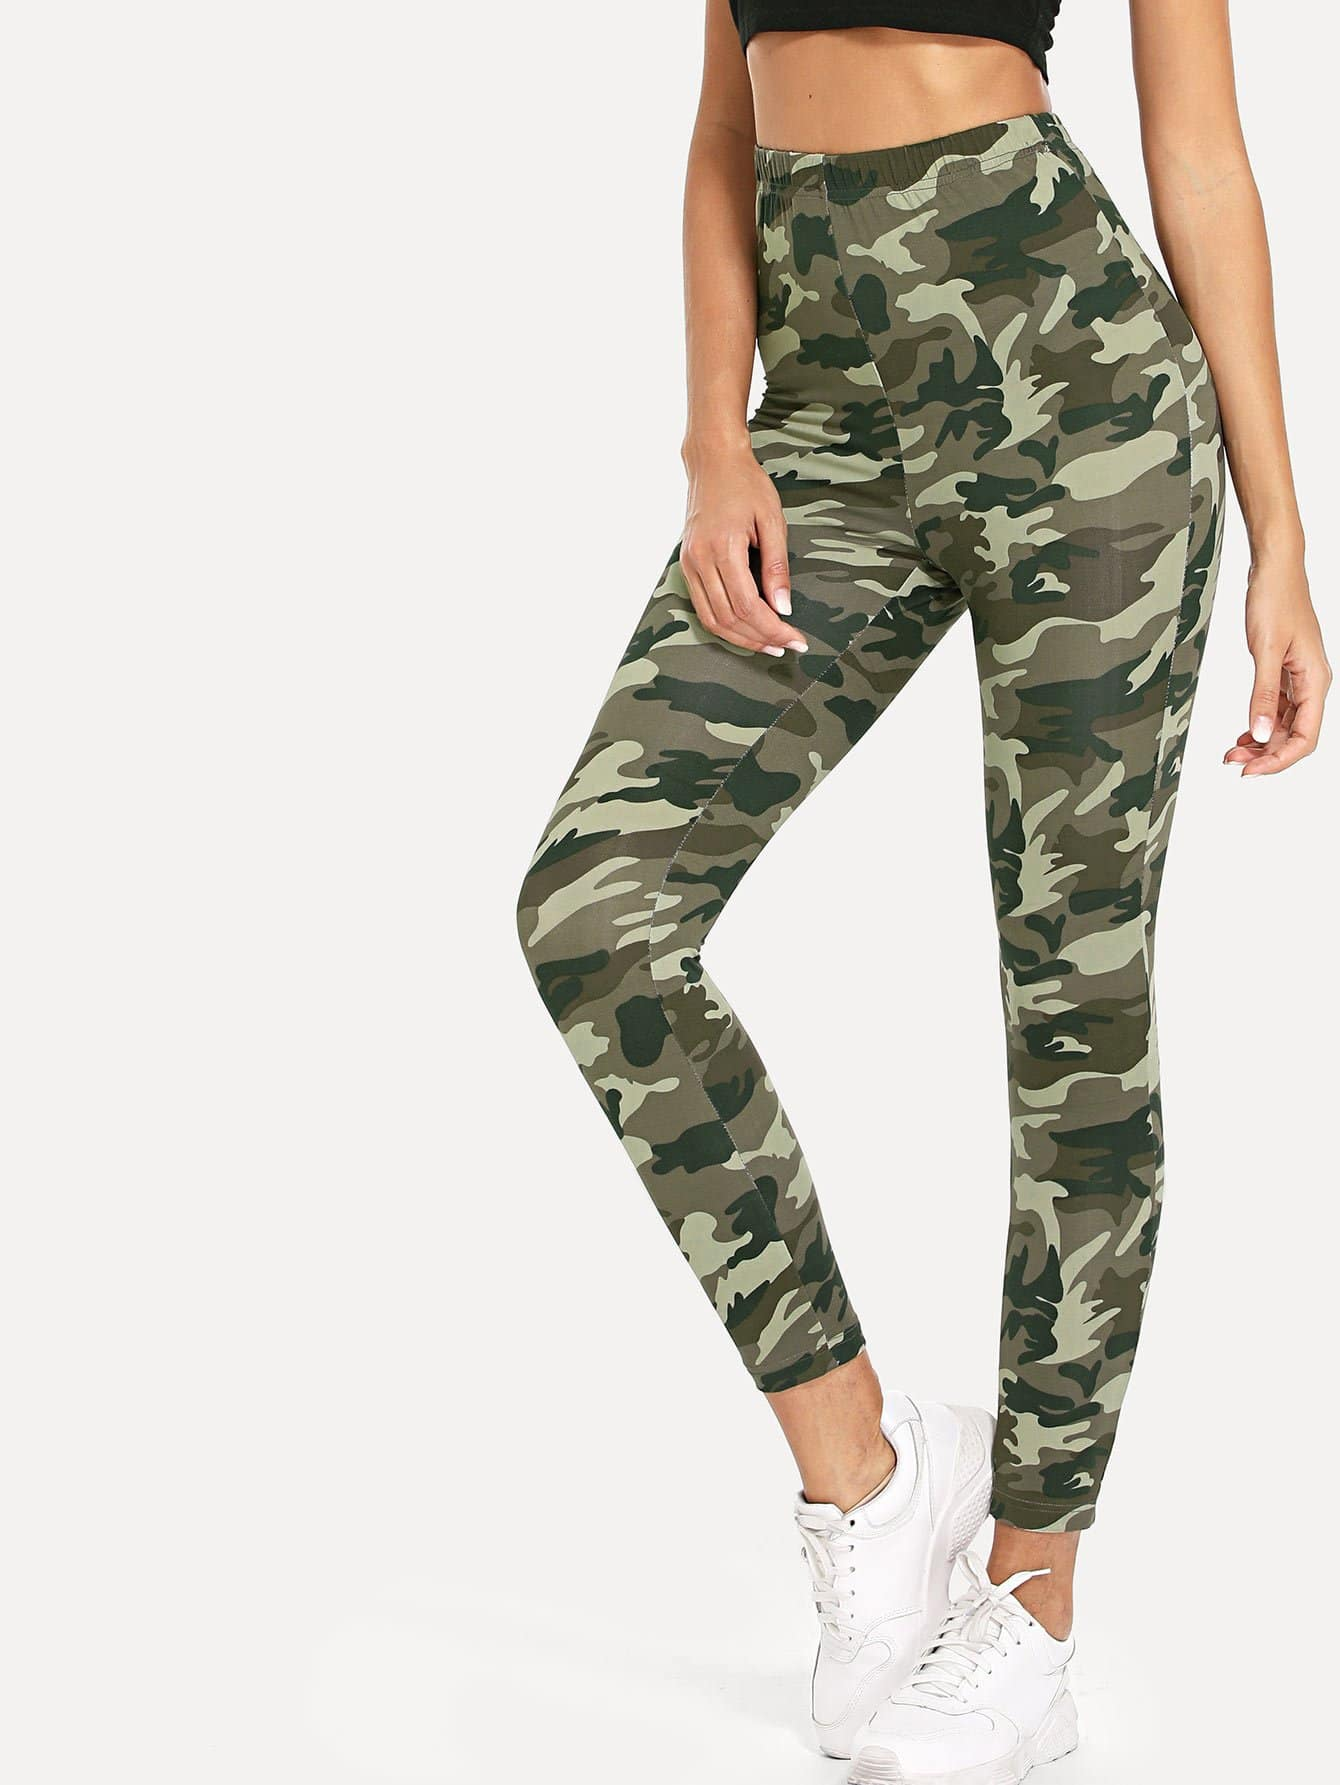 High Waist Camo Print Skinny Leggings high waist color block skinny sports leggings